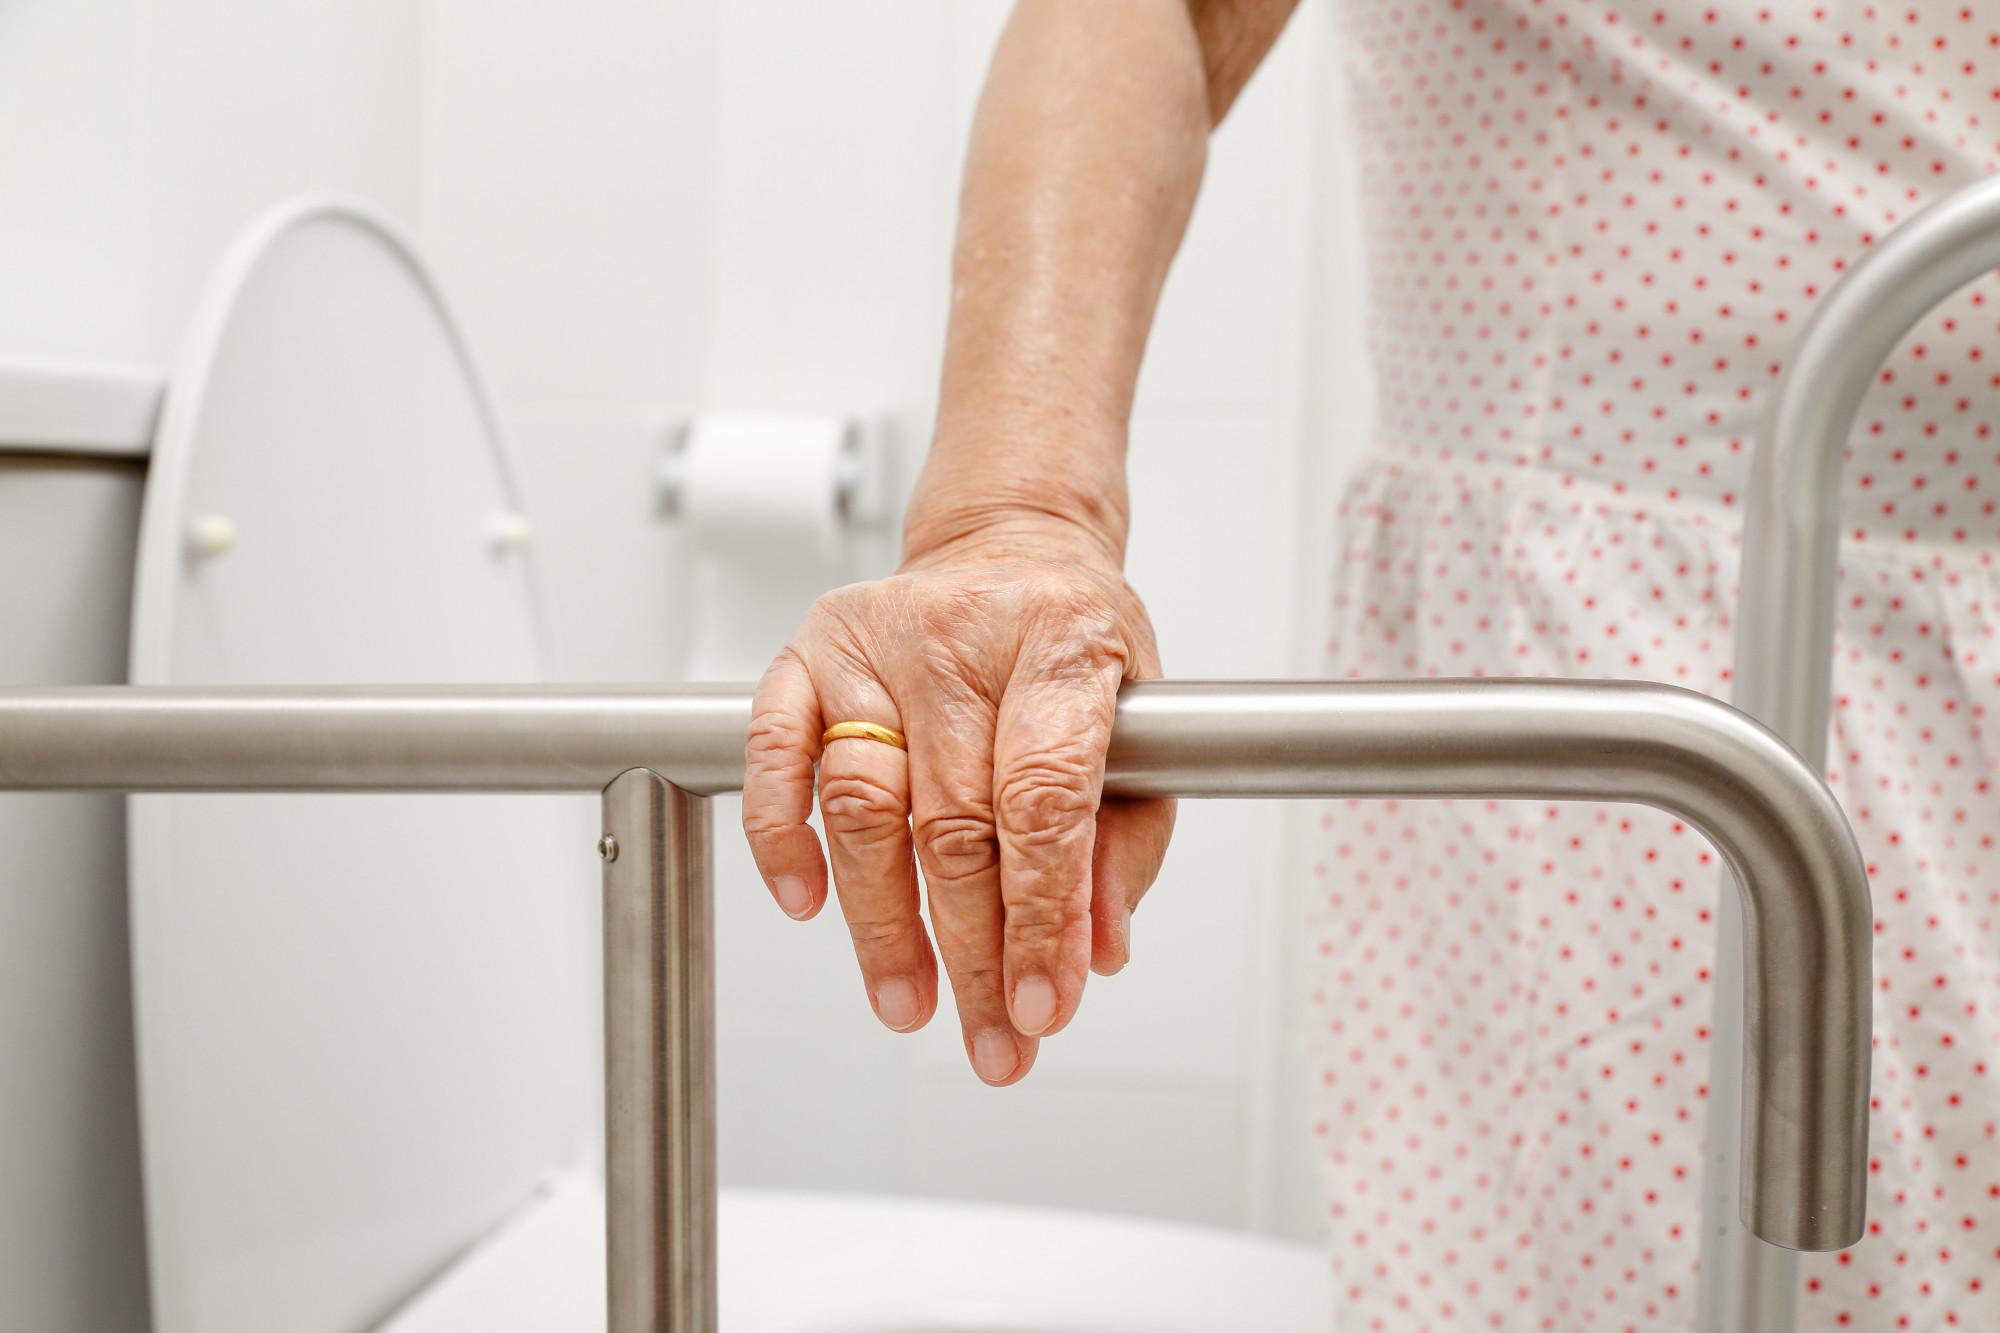 Bathroom Safety Tips for Seniors